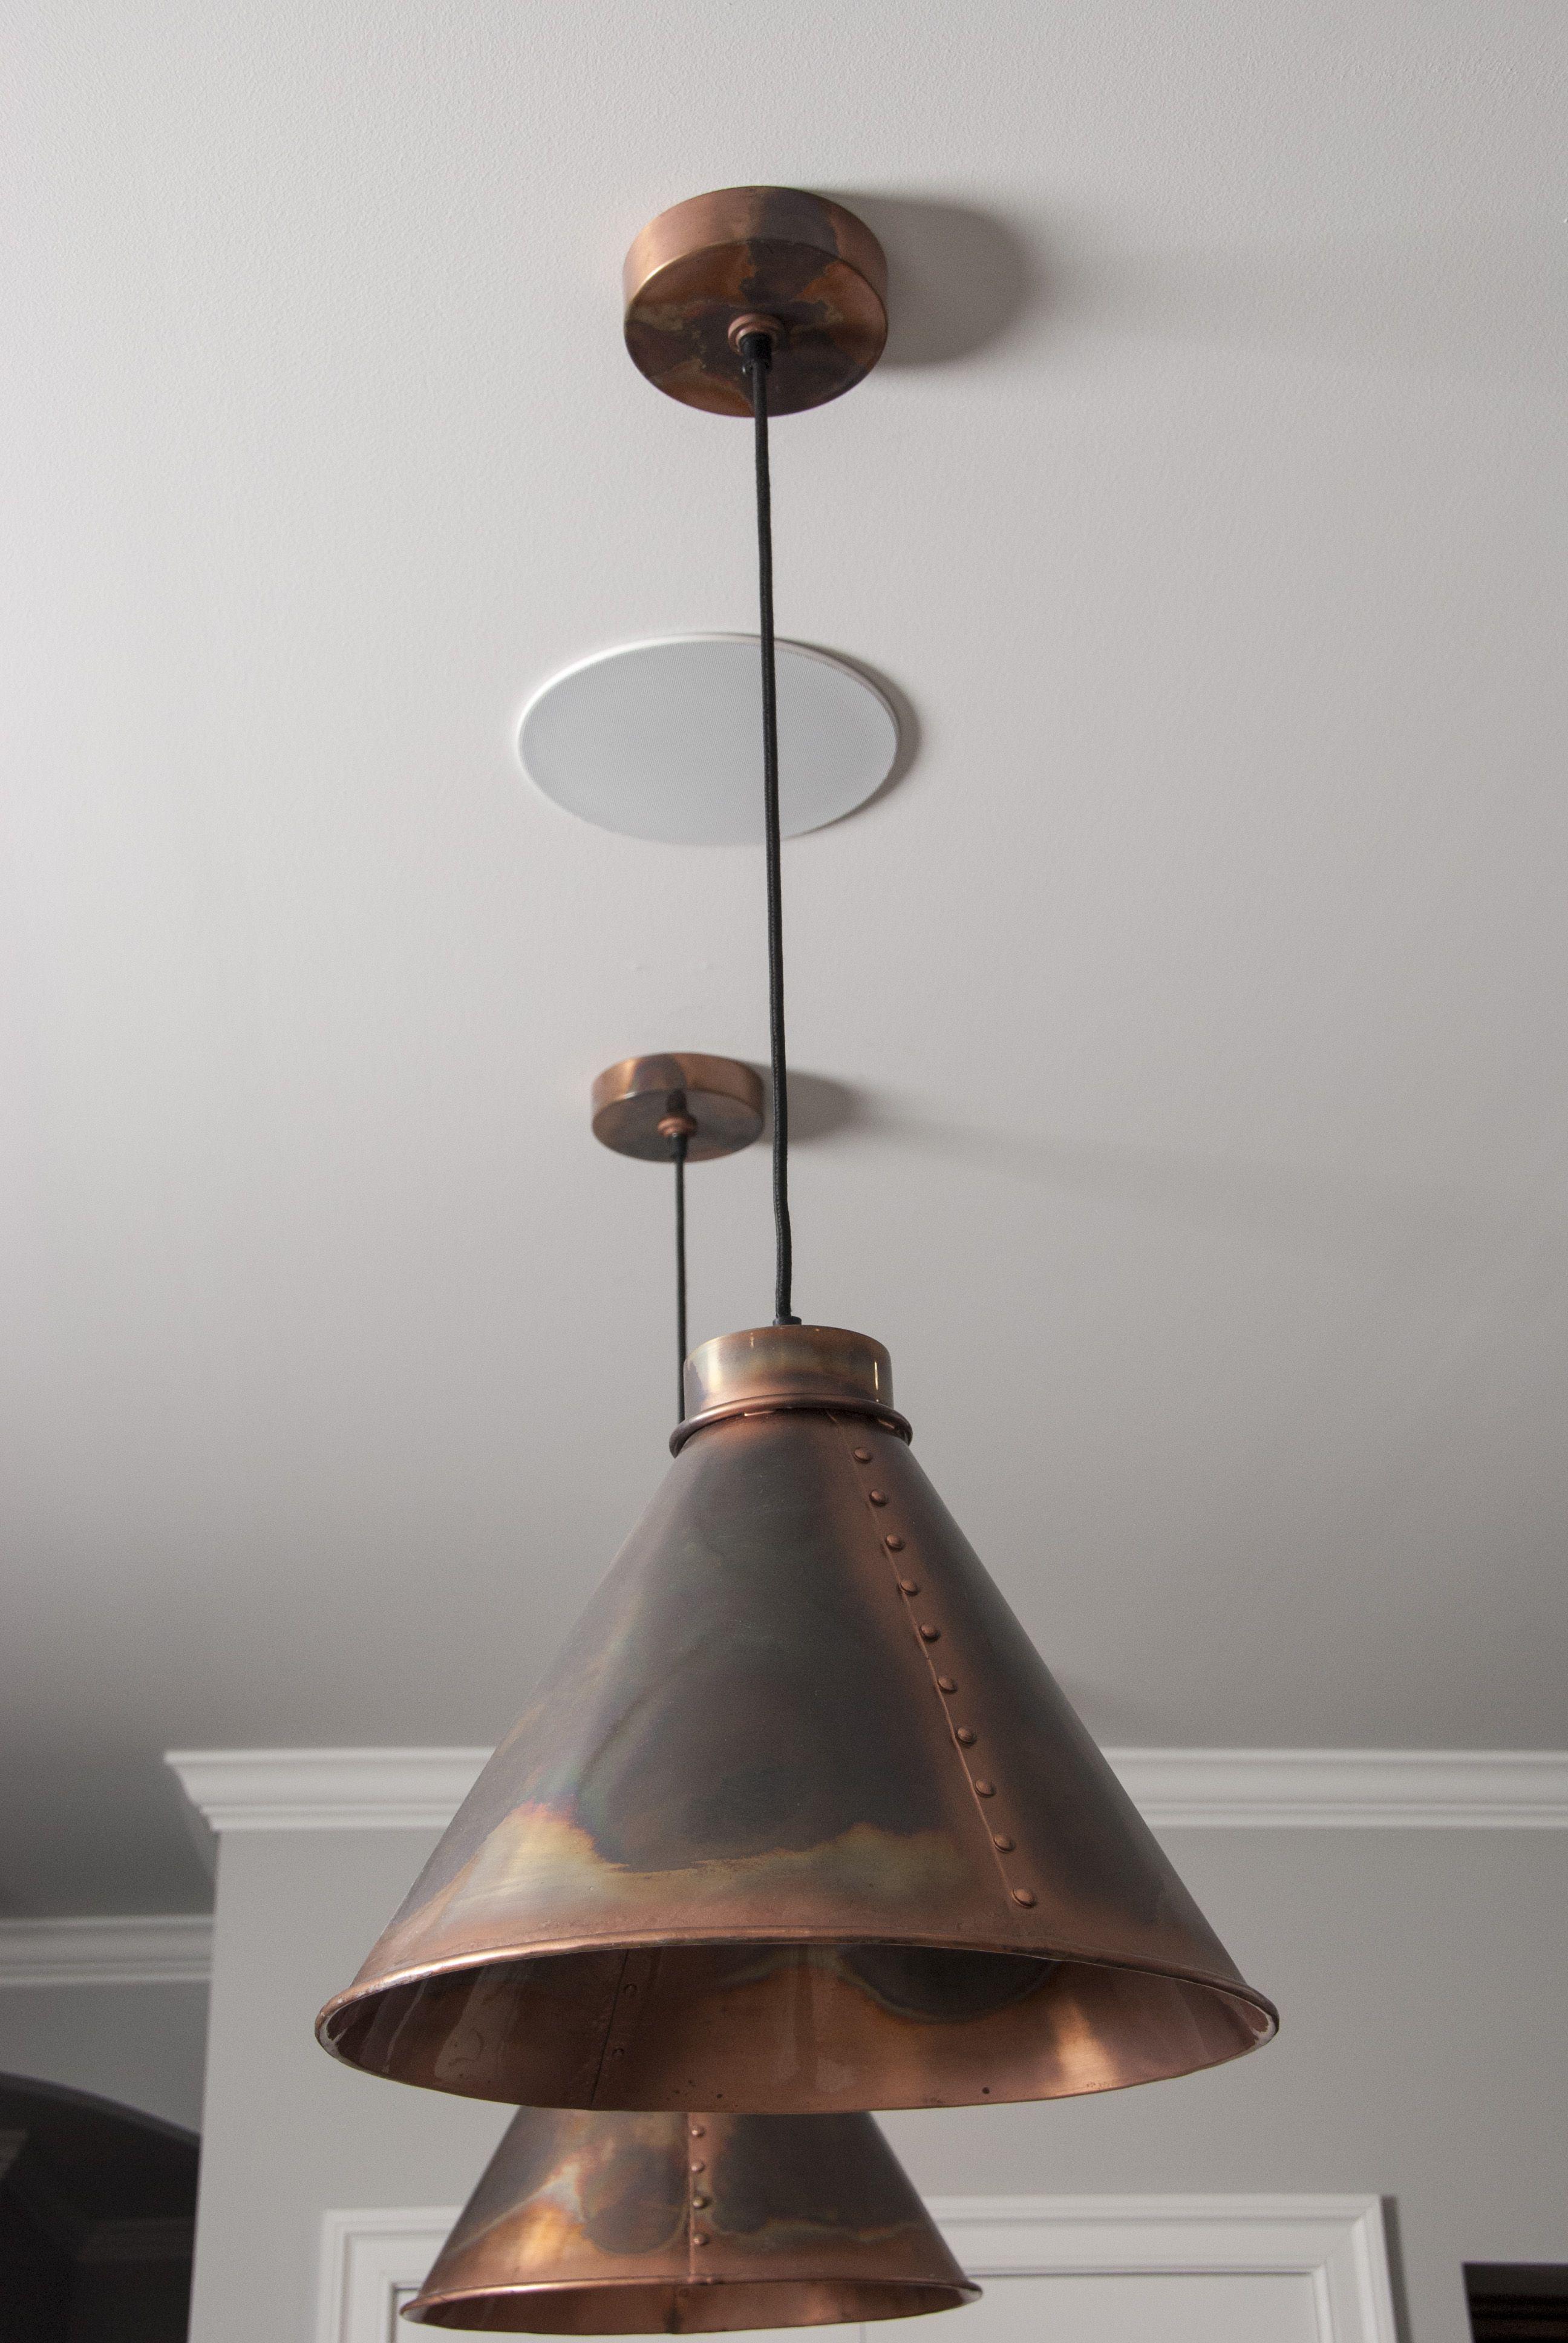 Copper pendants island lights patina finish cone pendants neo industrial industrial kitchen